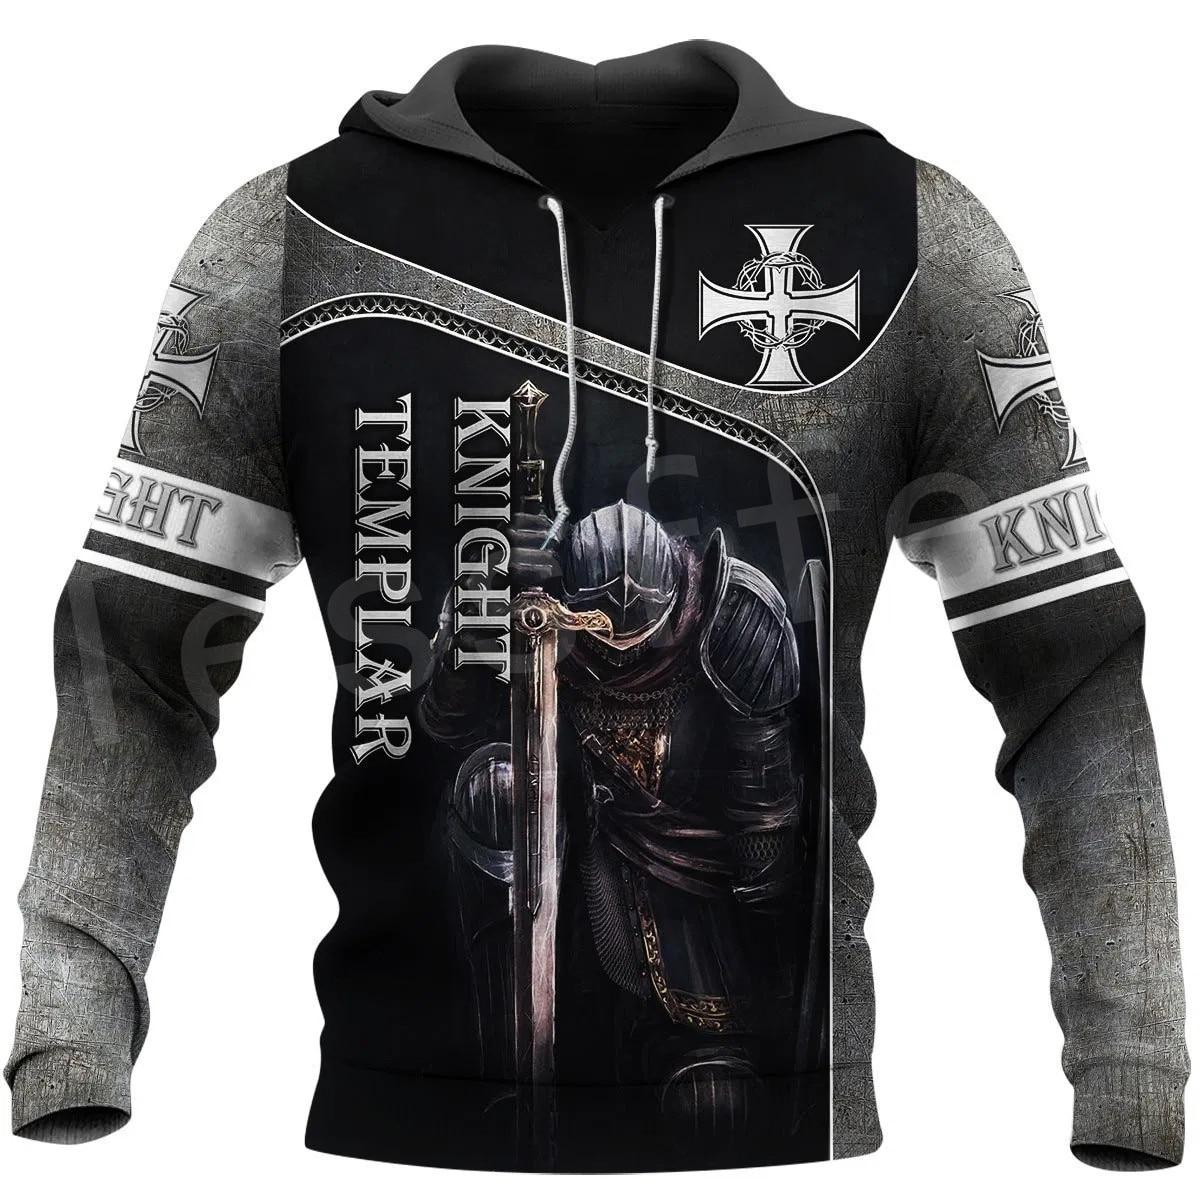 Tessffel Knight Templar Costume Armor Pullover NewFashion Harajuku Streetwear 3DPrint Unisex Zipper/Hoodies/Sweatshirt/Jacket 22